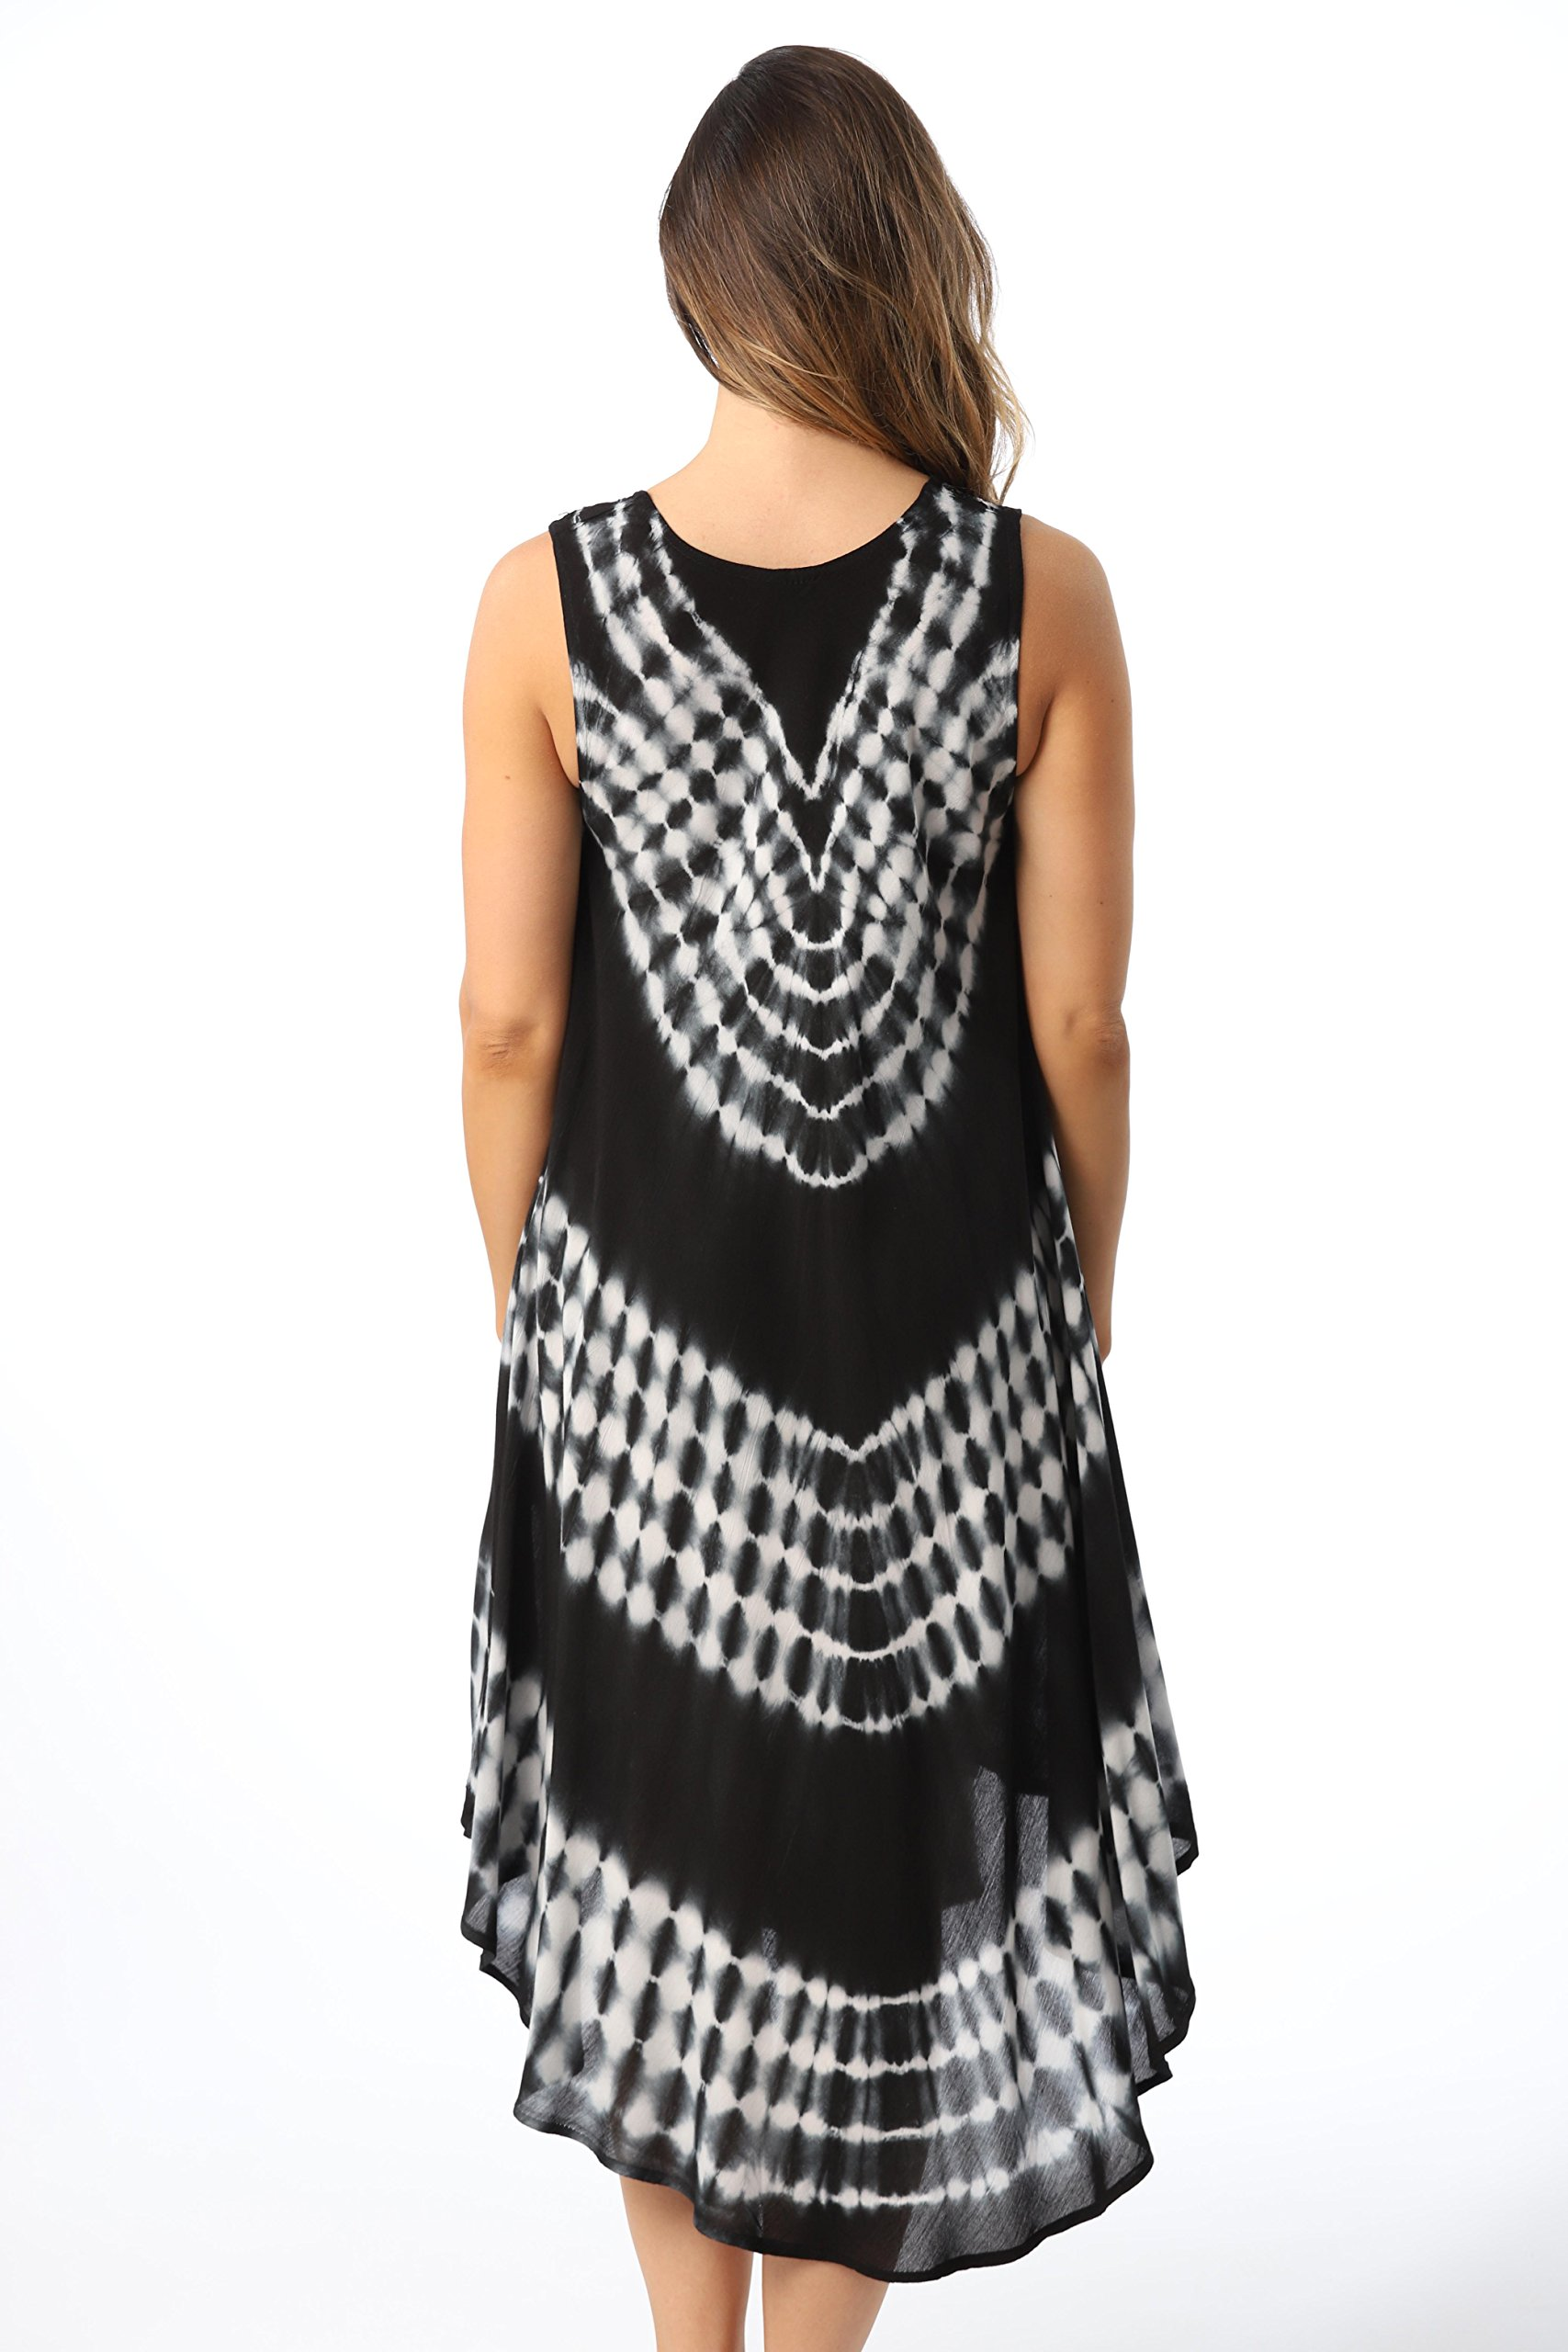 Riviera Sun 21802-BLK-L Dress Dresses For Women by Riviera Sun (Image #4)